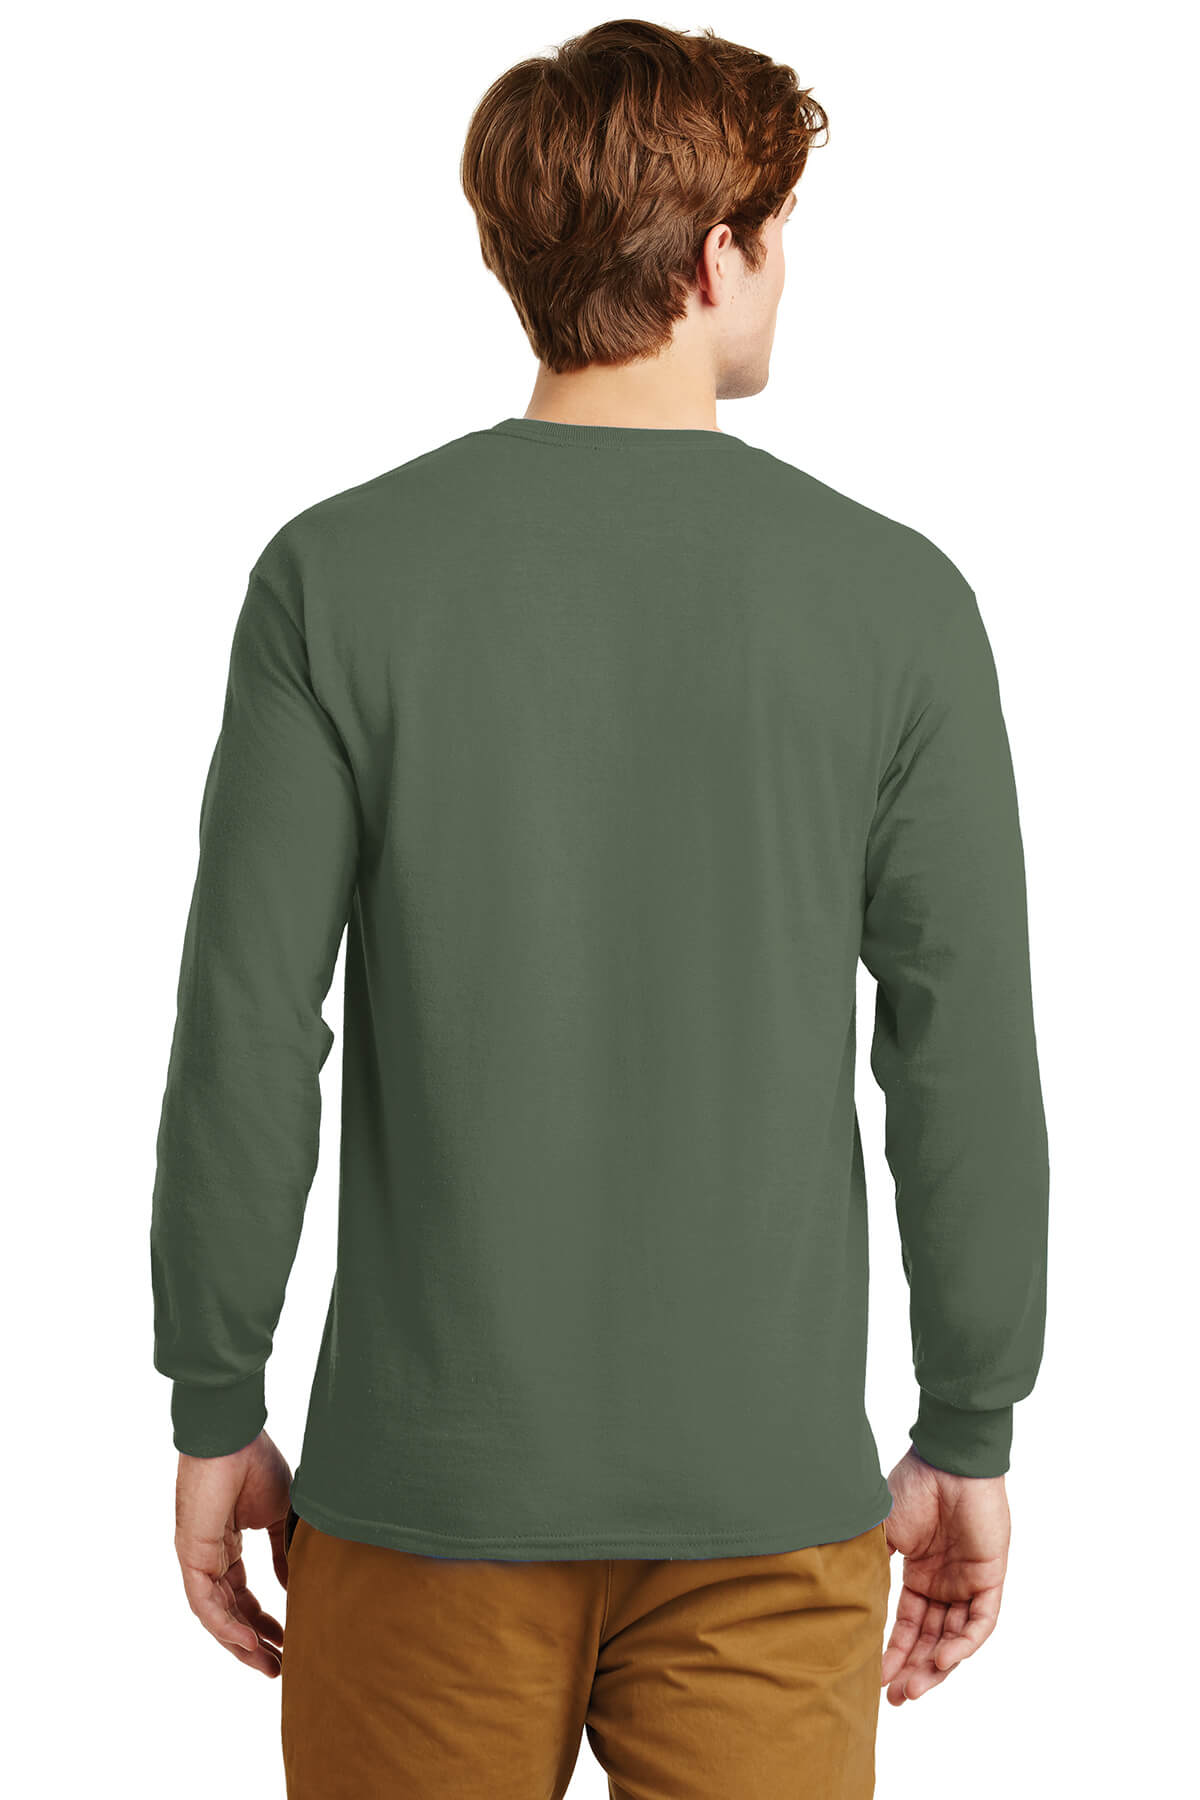 g2400-military-green-1